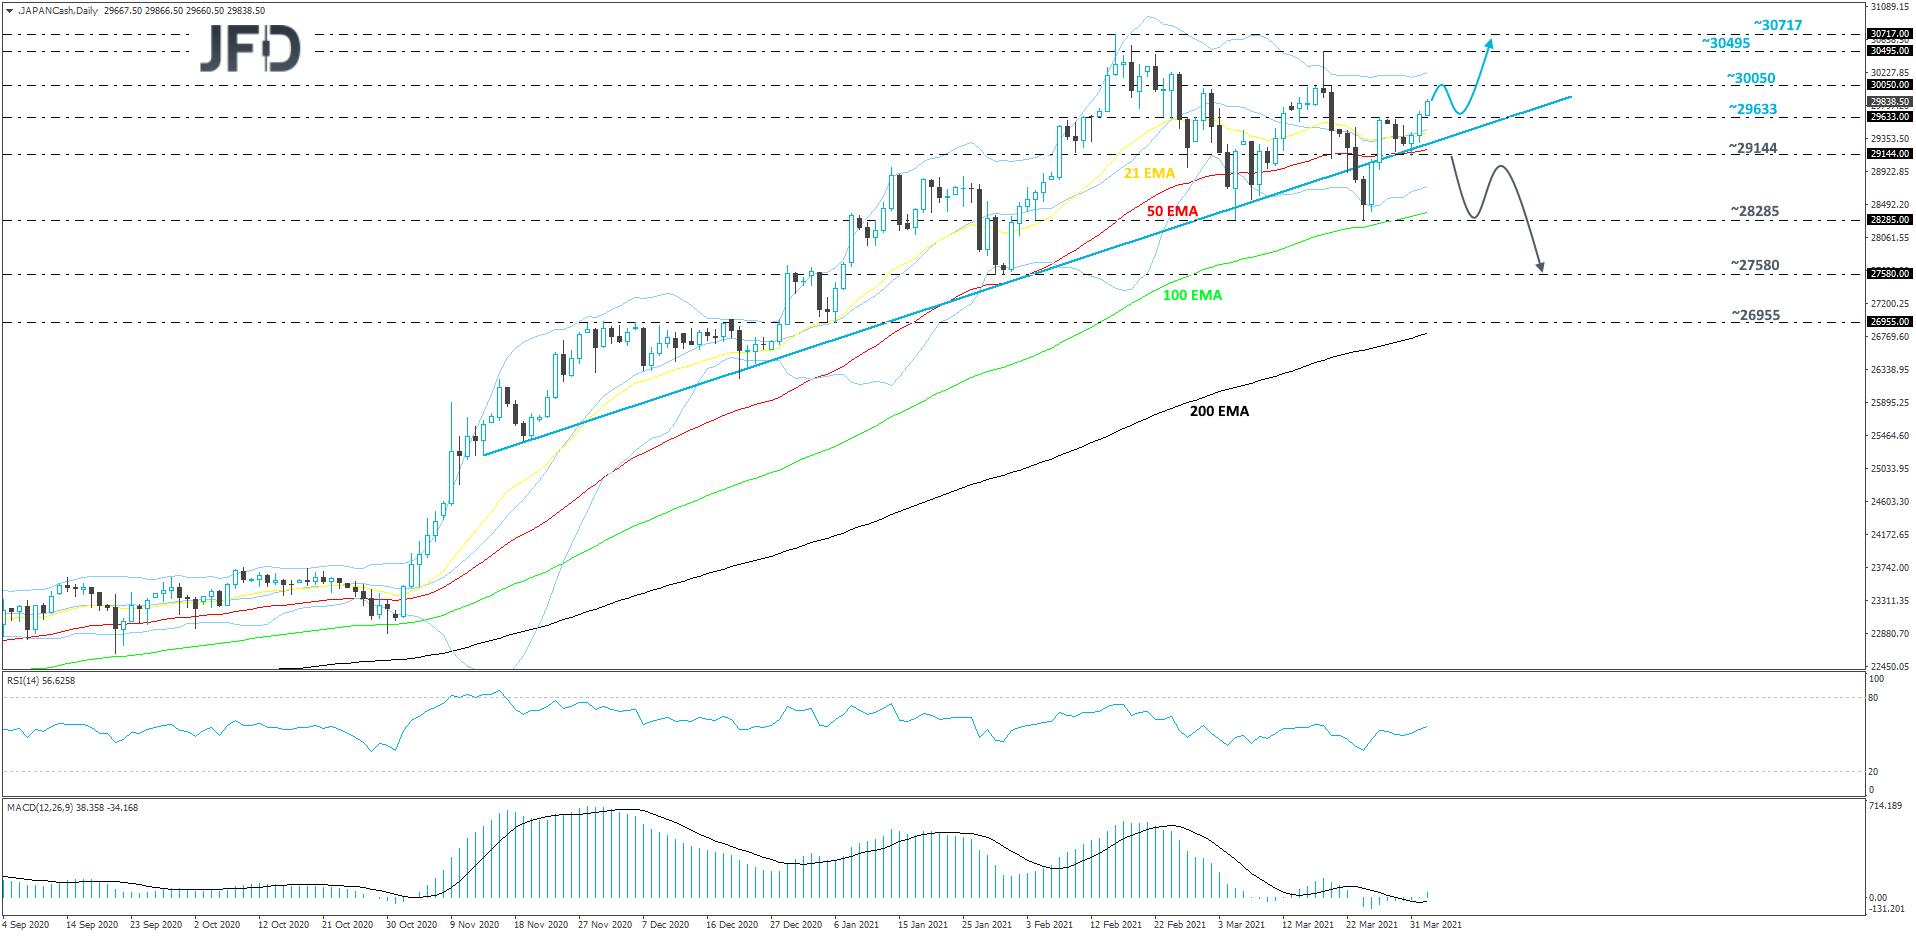 Nikkei 225 daily chart technical analysis